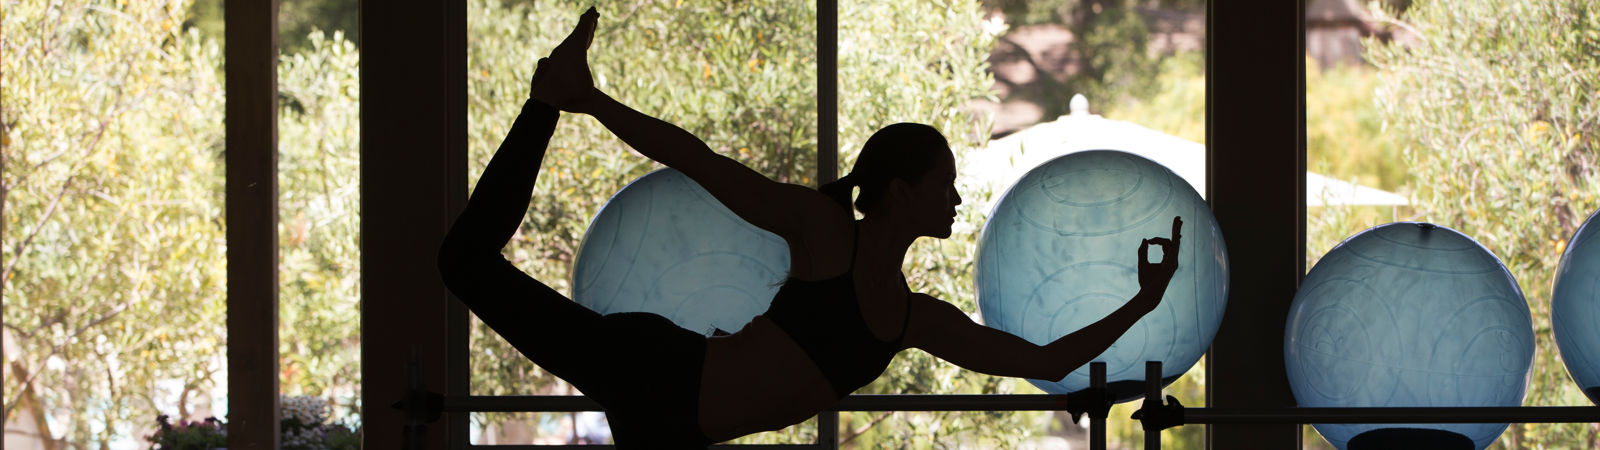 Carmel Valley Lifestyle Yoga 01 Low THS0614